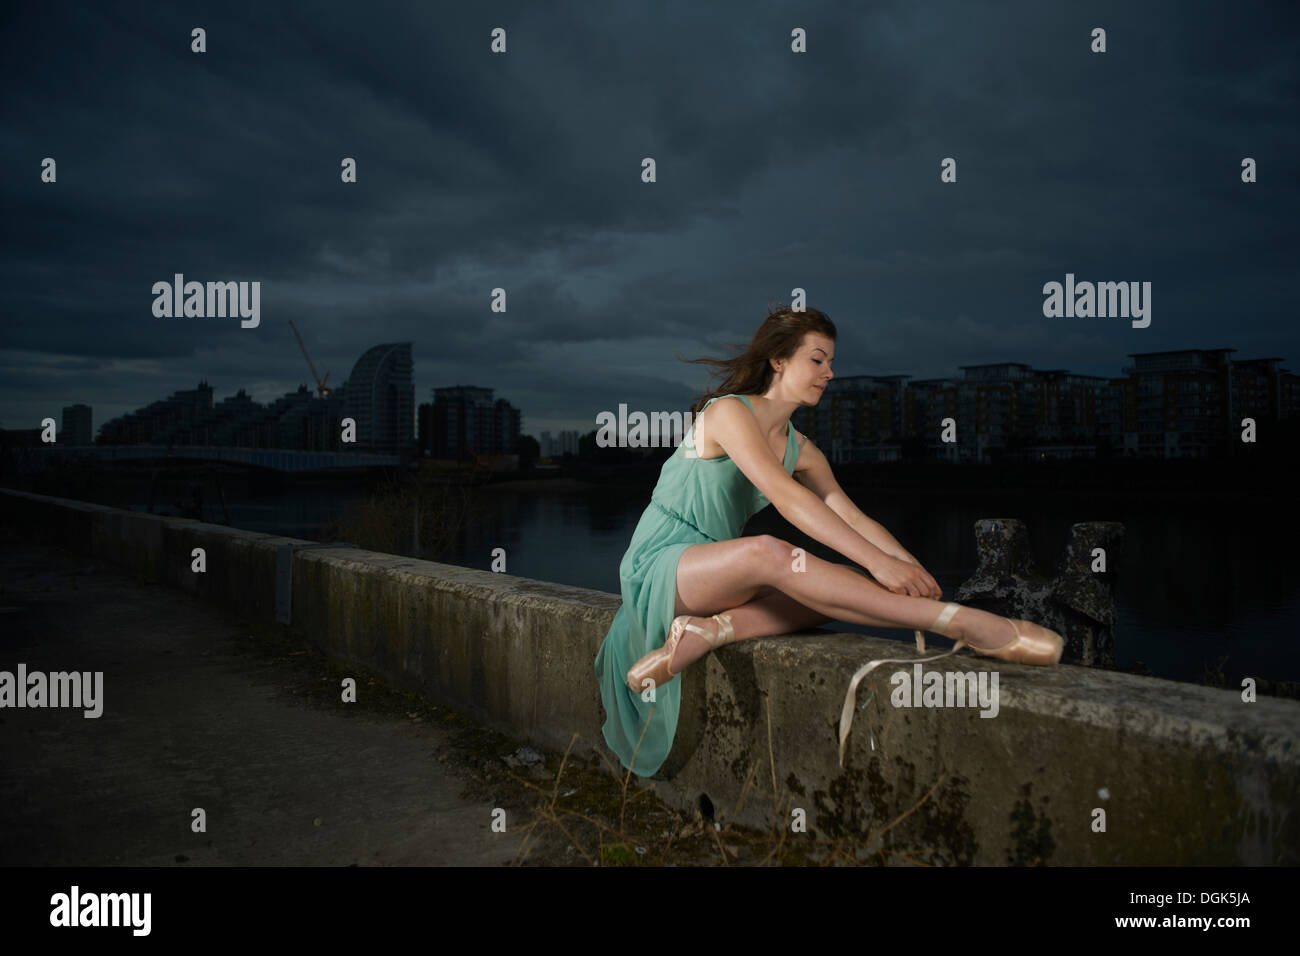 Ballet dancer sitting on wall - Stock Image